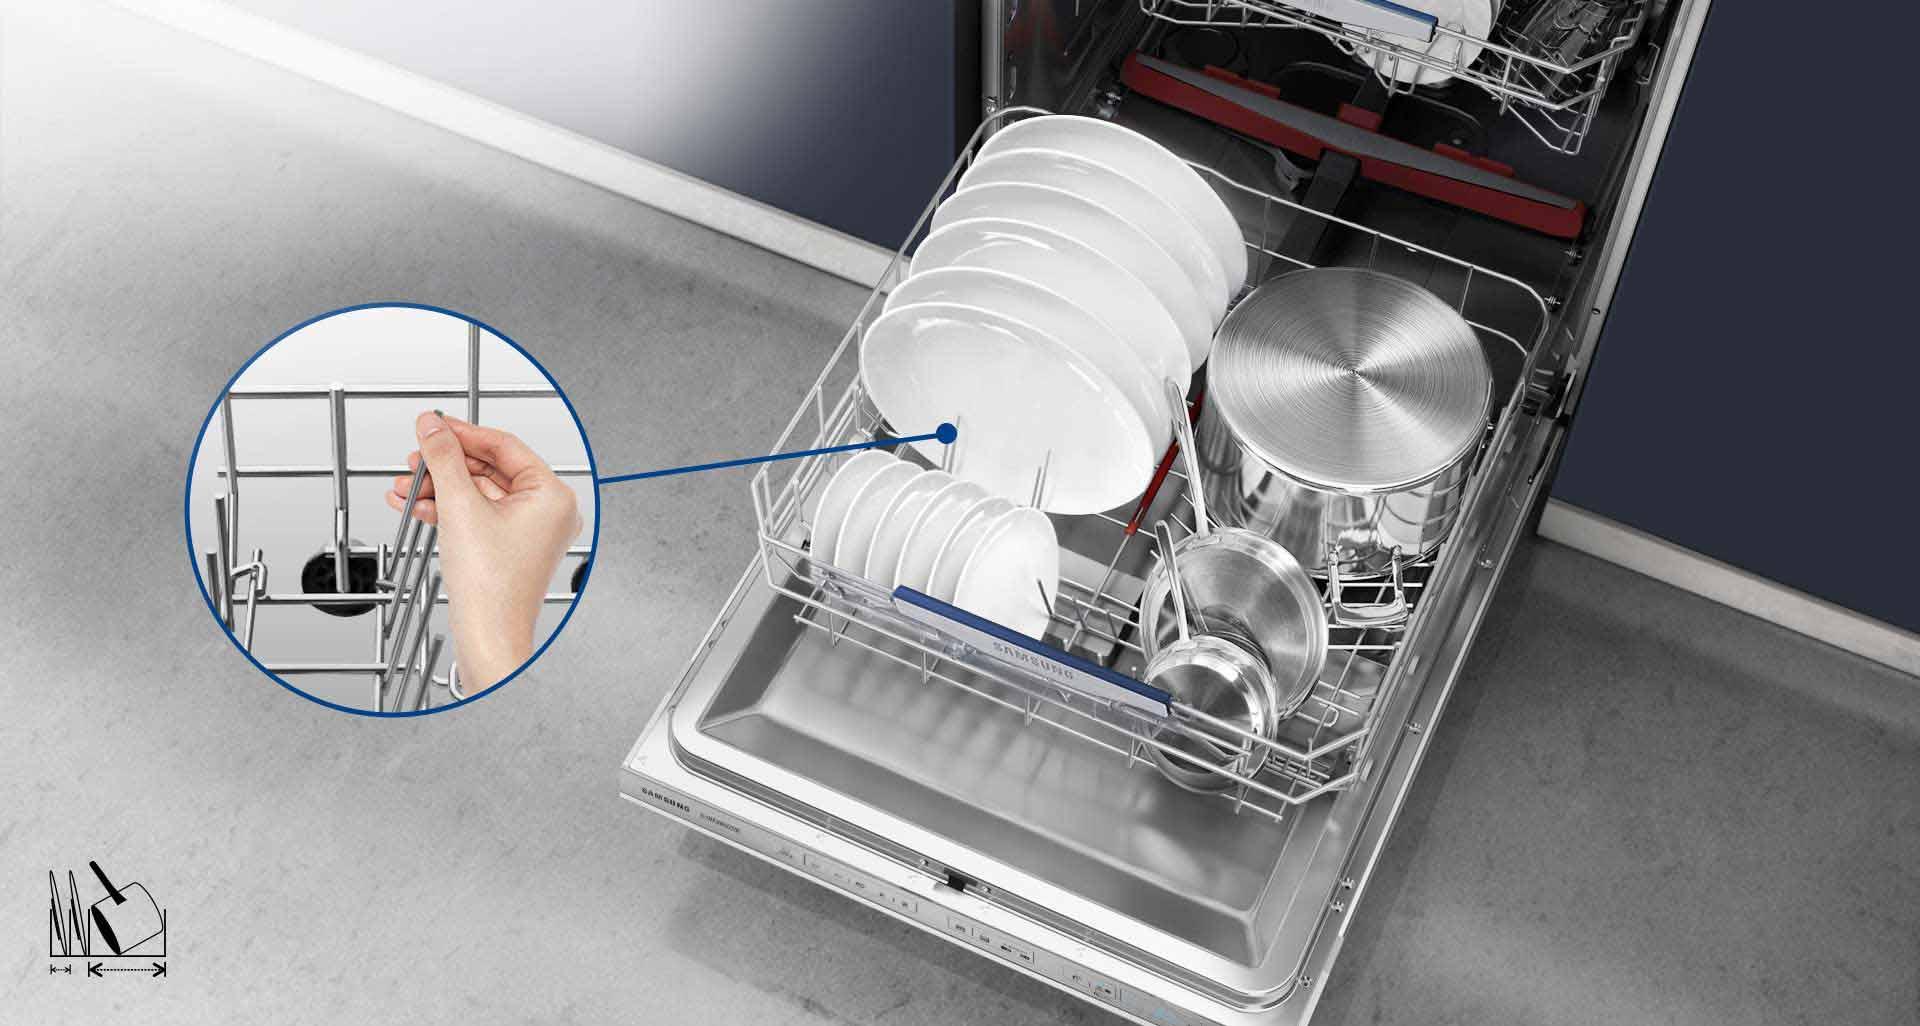 D162 دارای قابلیت شستشوی ظروف در اندازه های مختلف